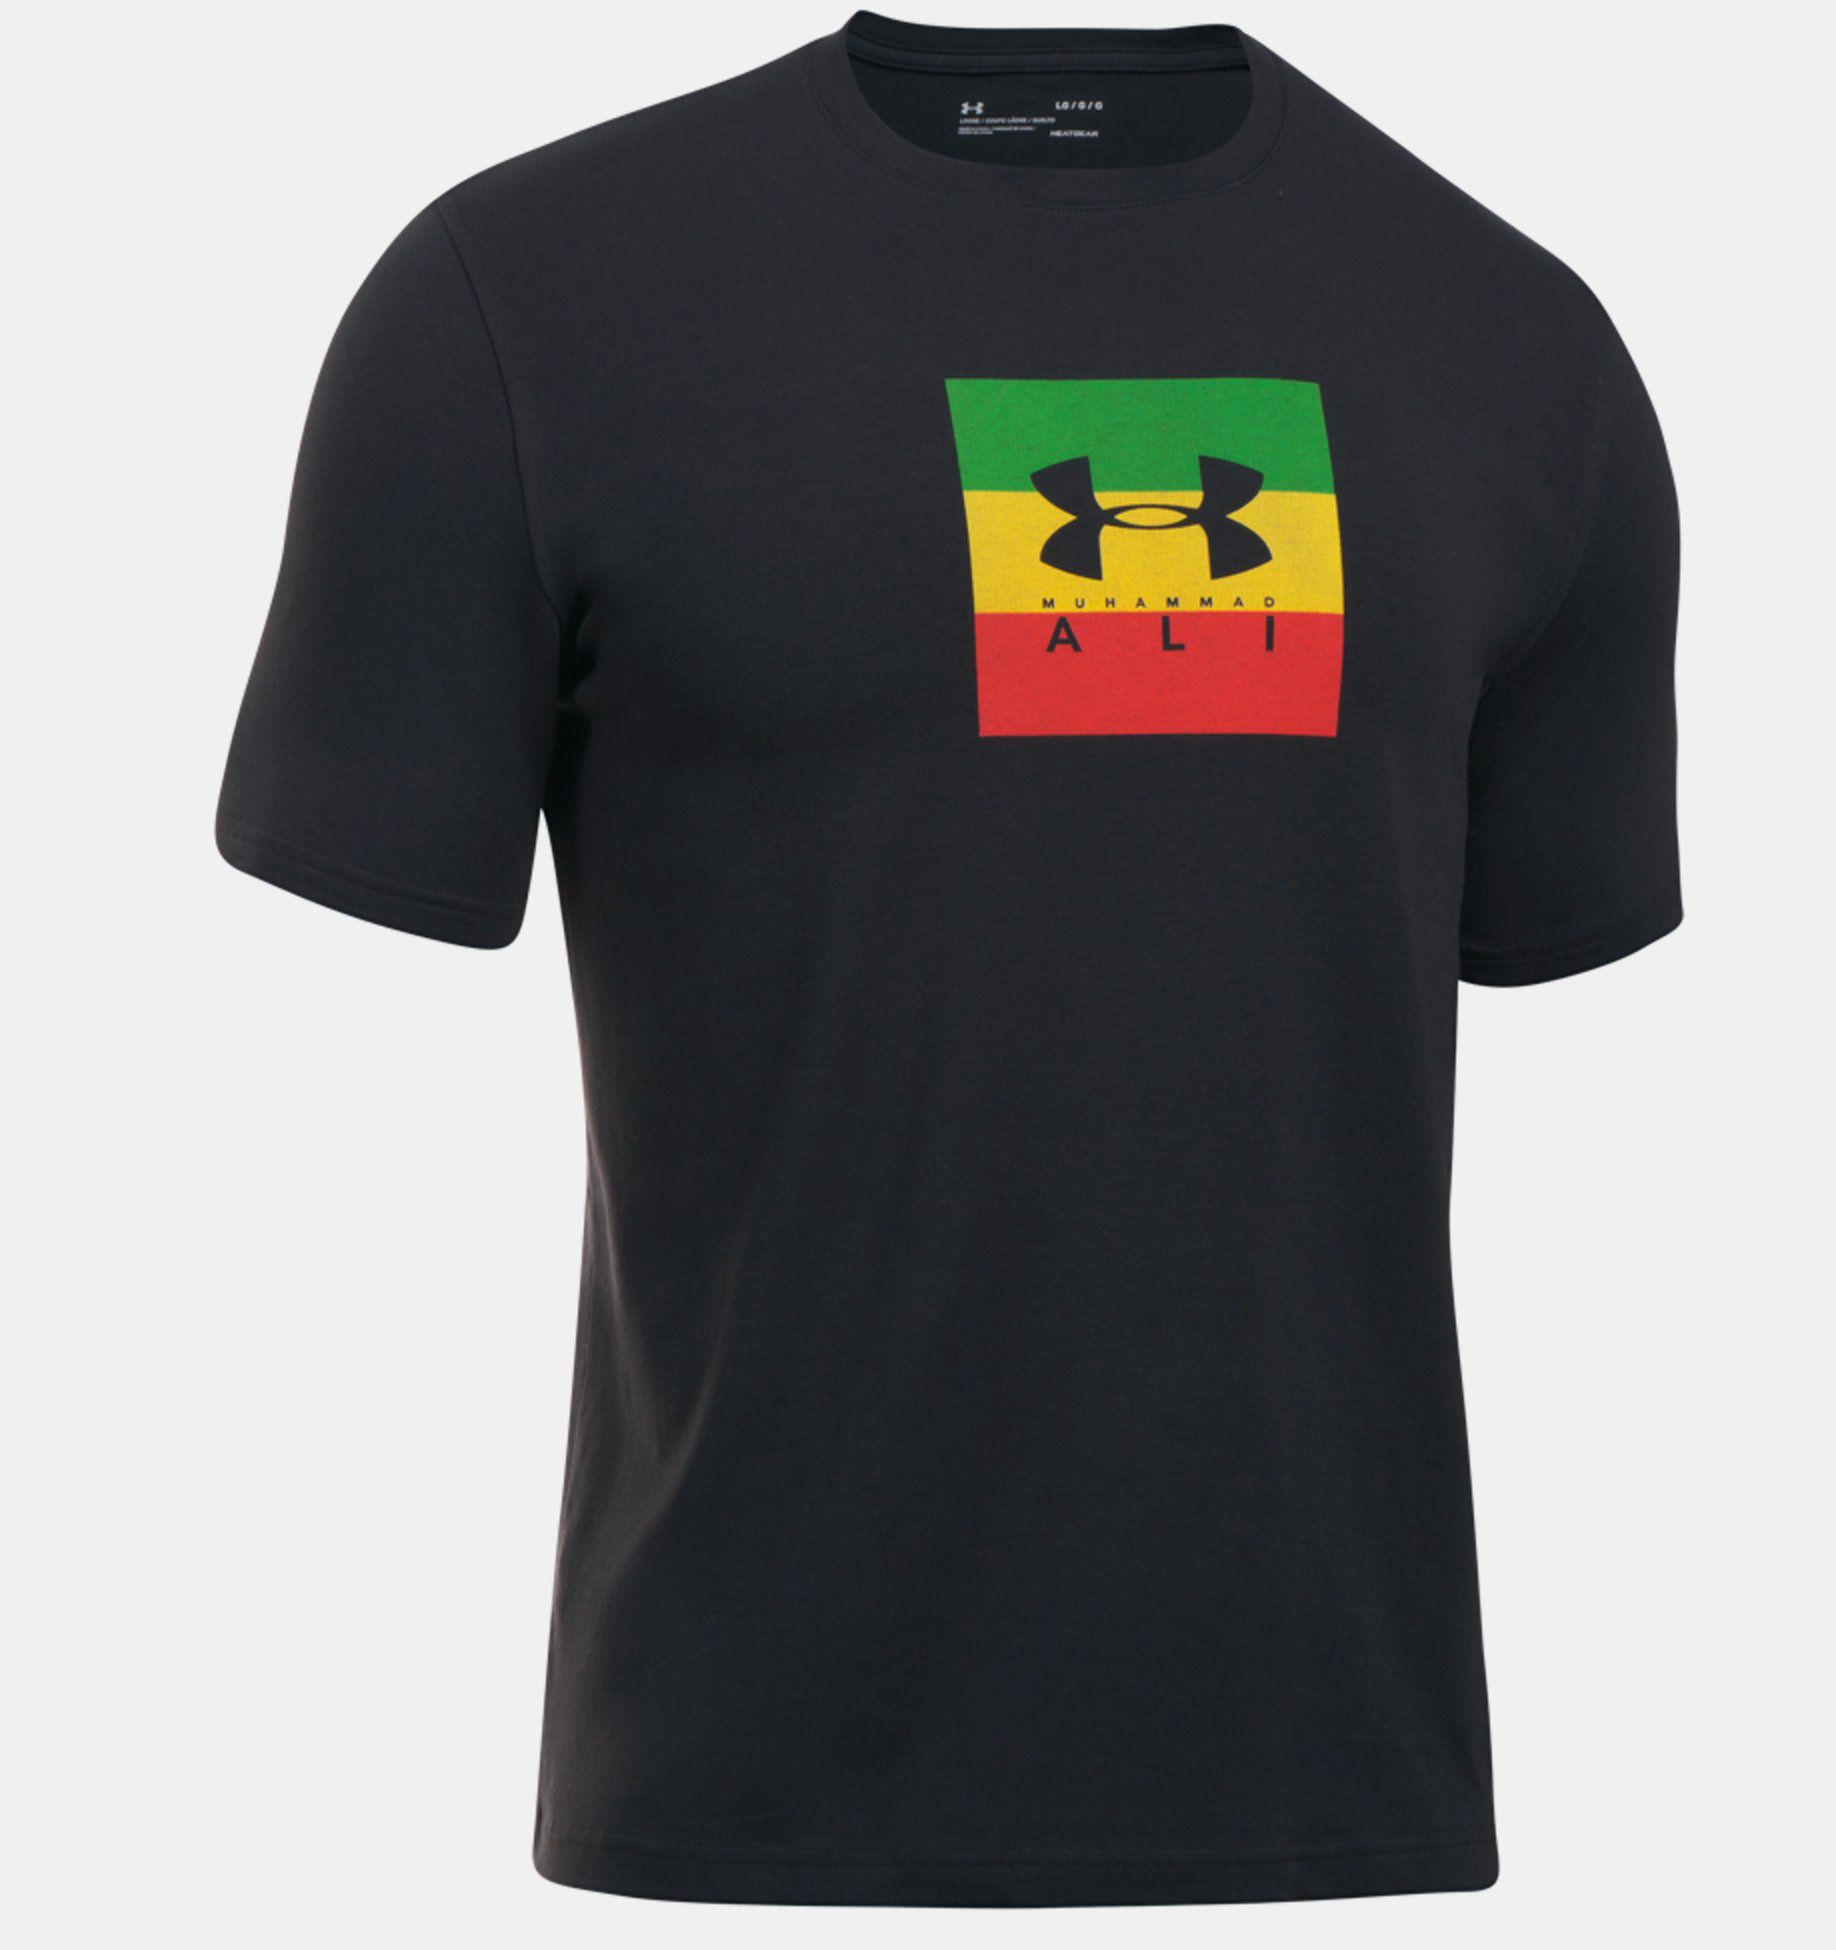 Camiseta Masculina Under Armour Ali Core